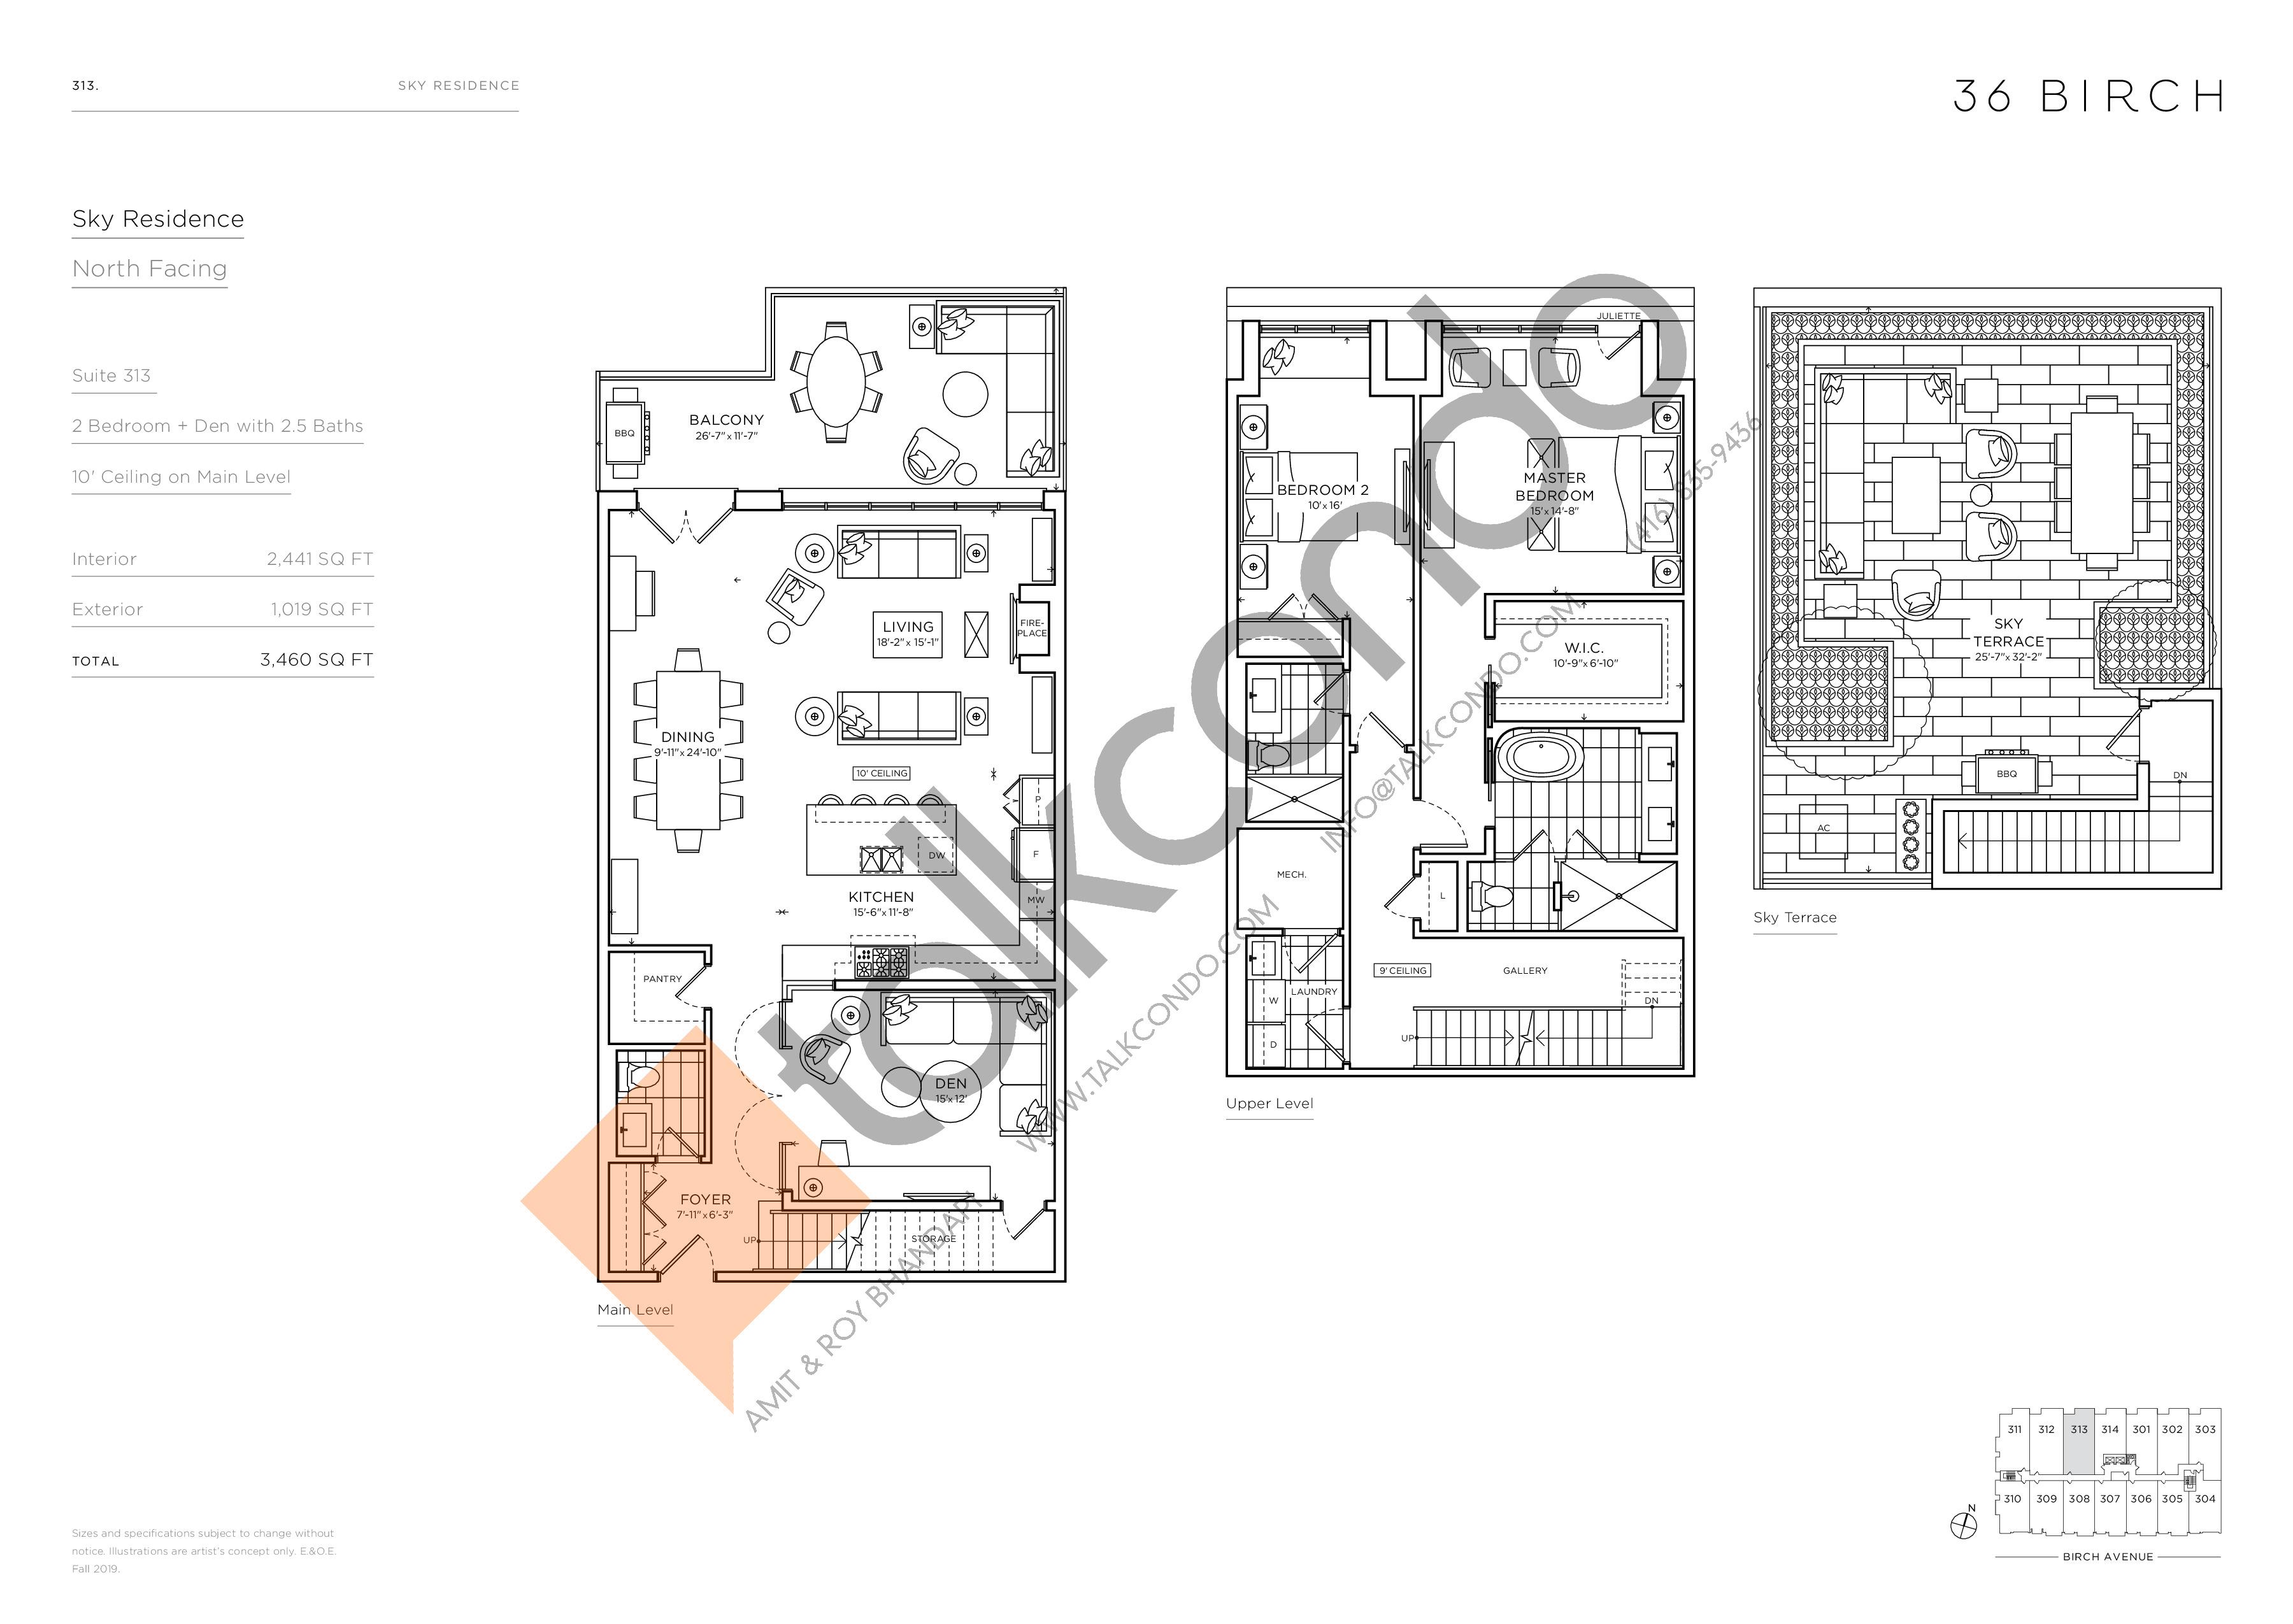 313 - Sky Residence Floor Plan at 36 Birch Condos - 2441 sq.ft